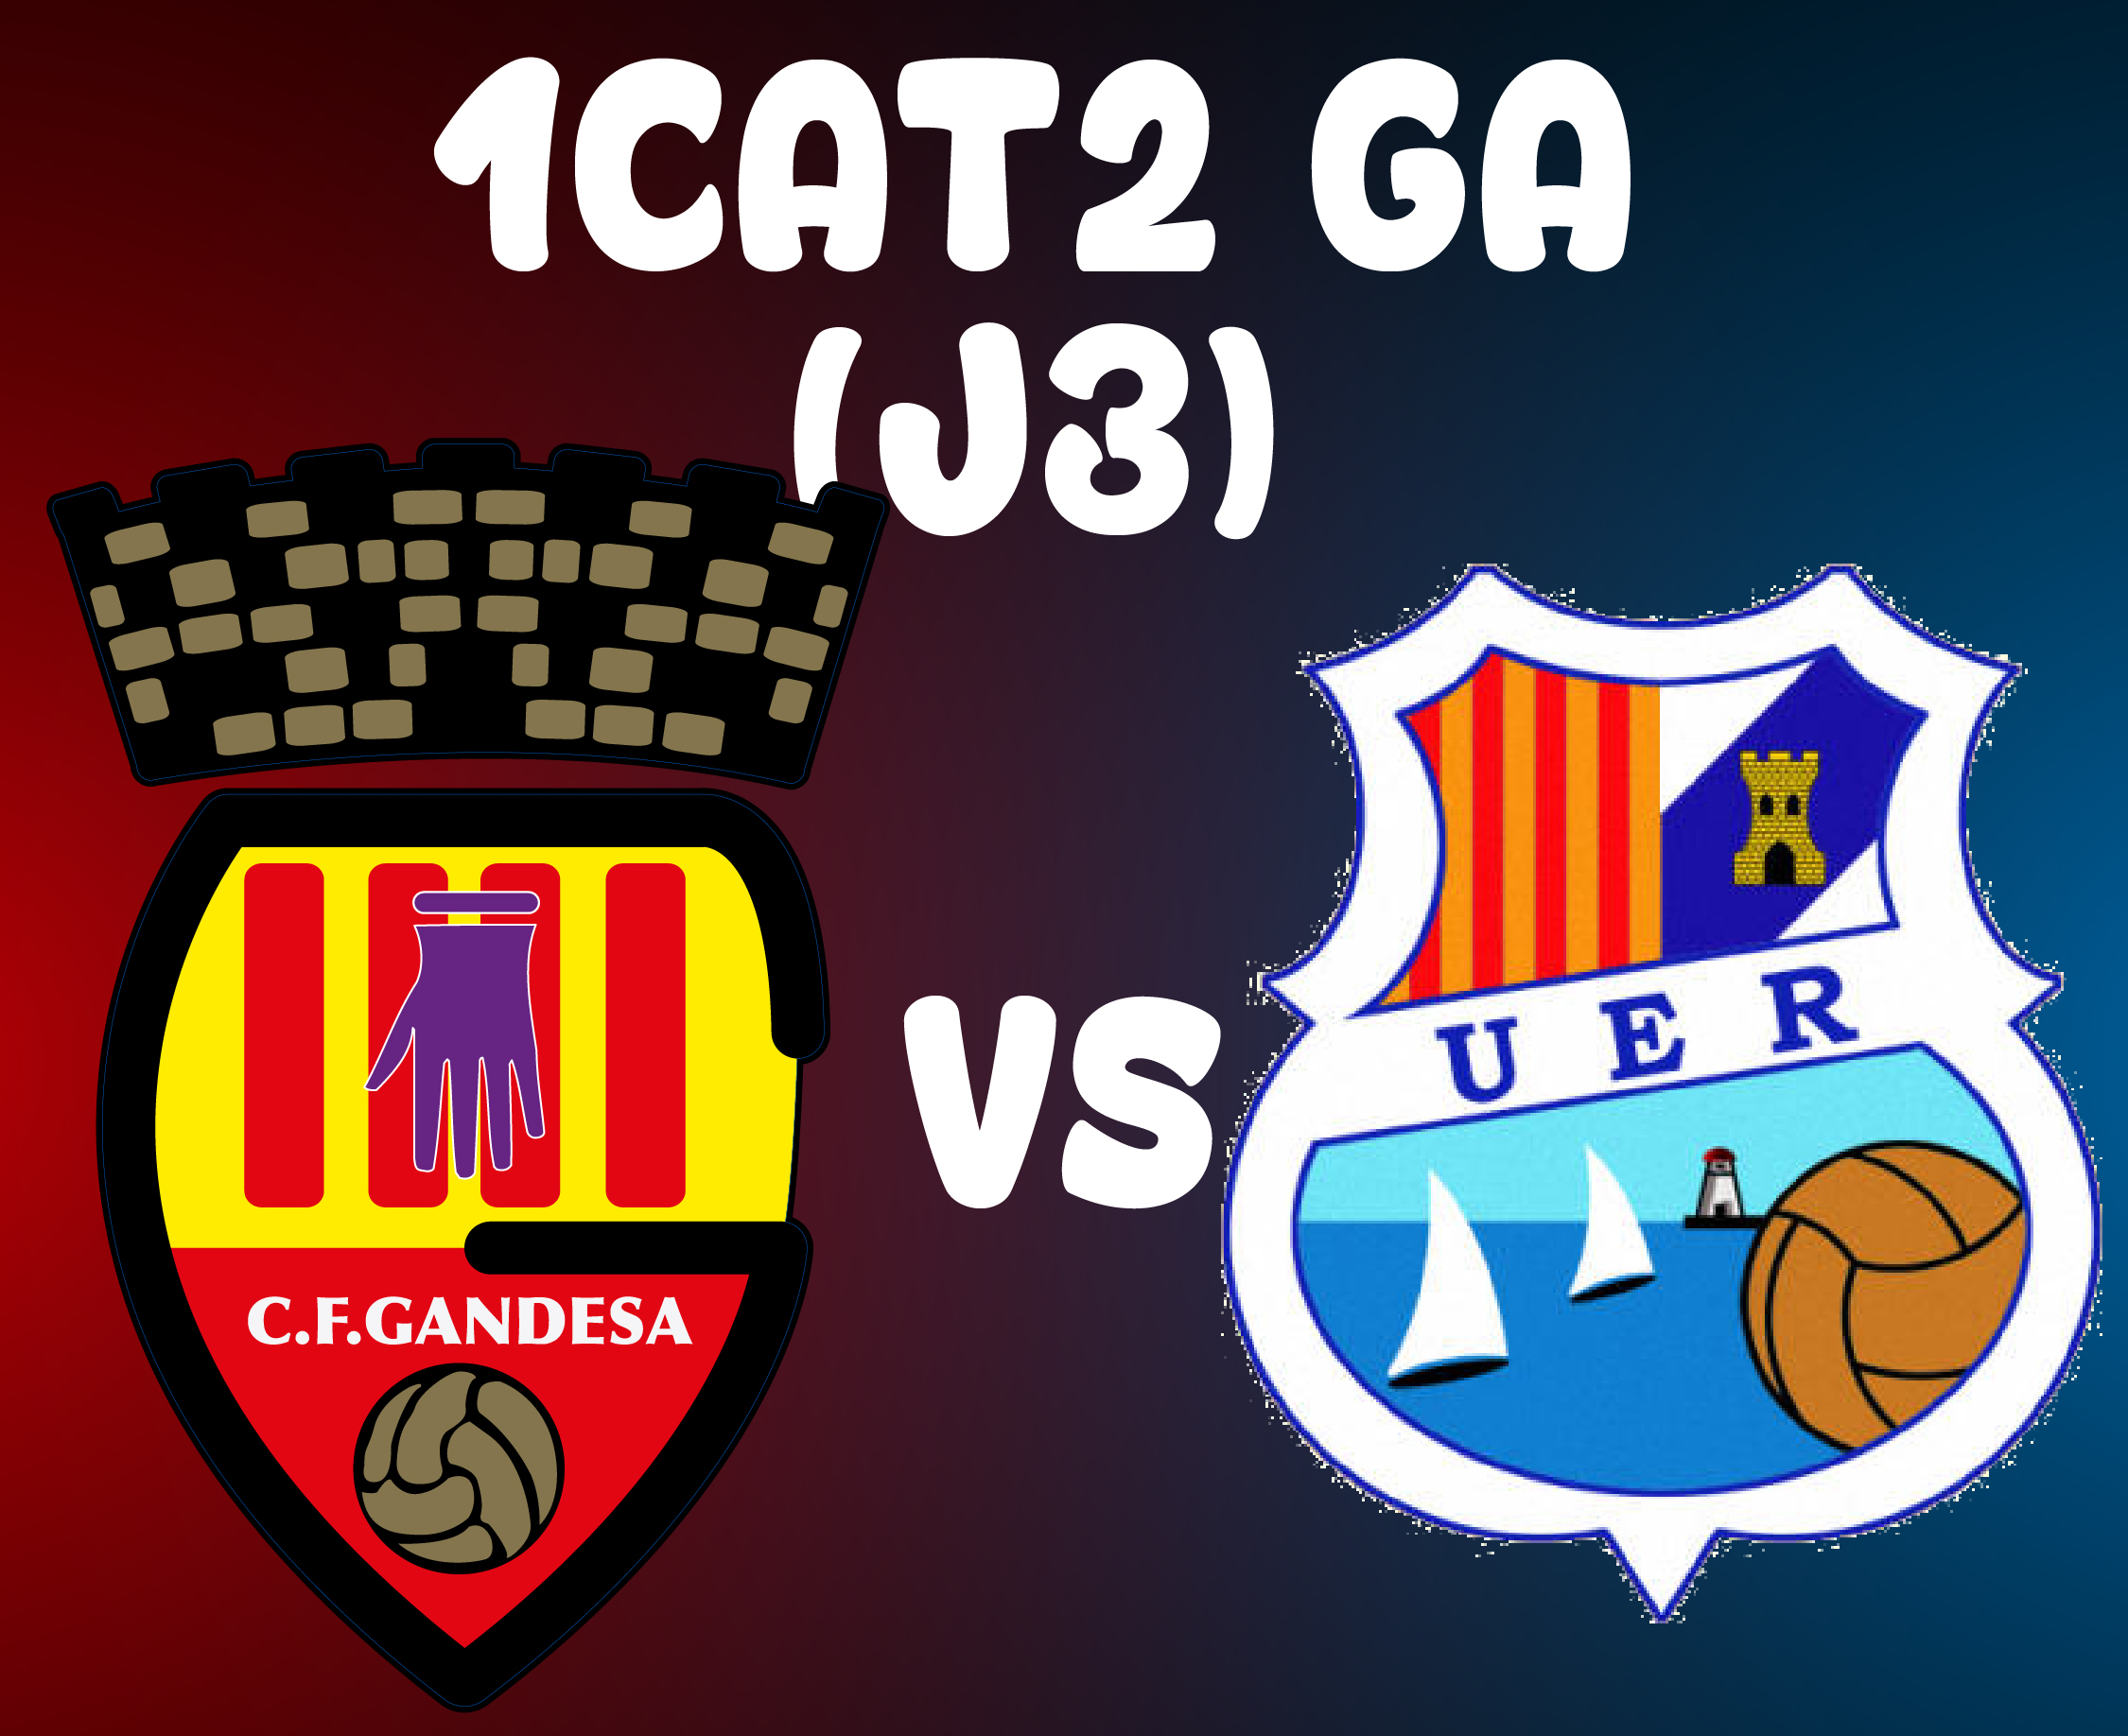 J3 > CF GANDESA (A) VS UE RAPITENCA